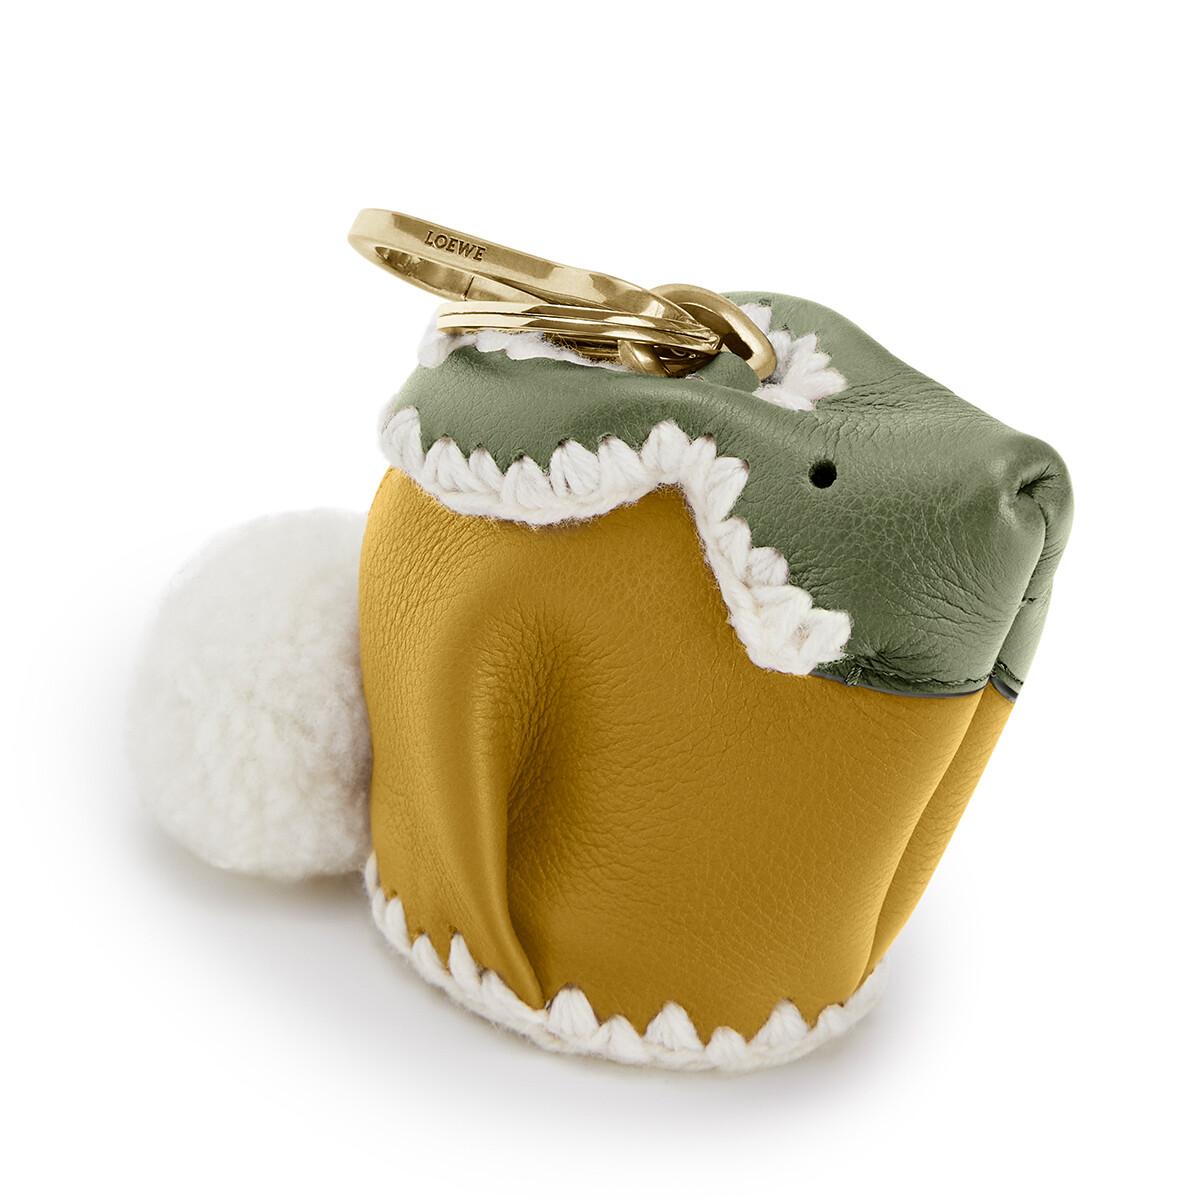 LOEWE Charm Conejo Crochet Ocre/Musco front